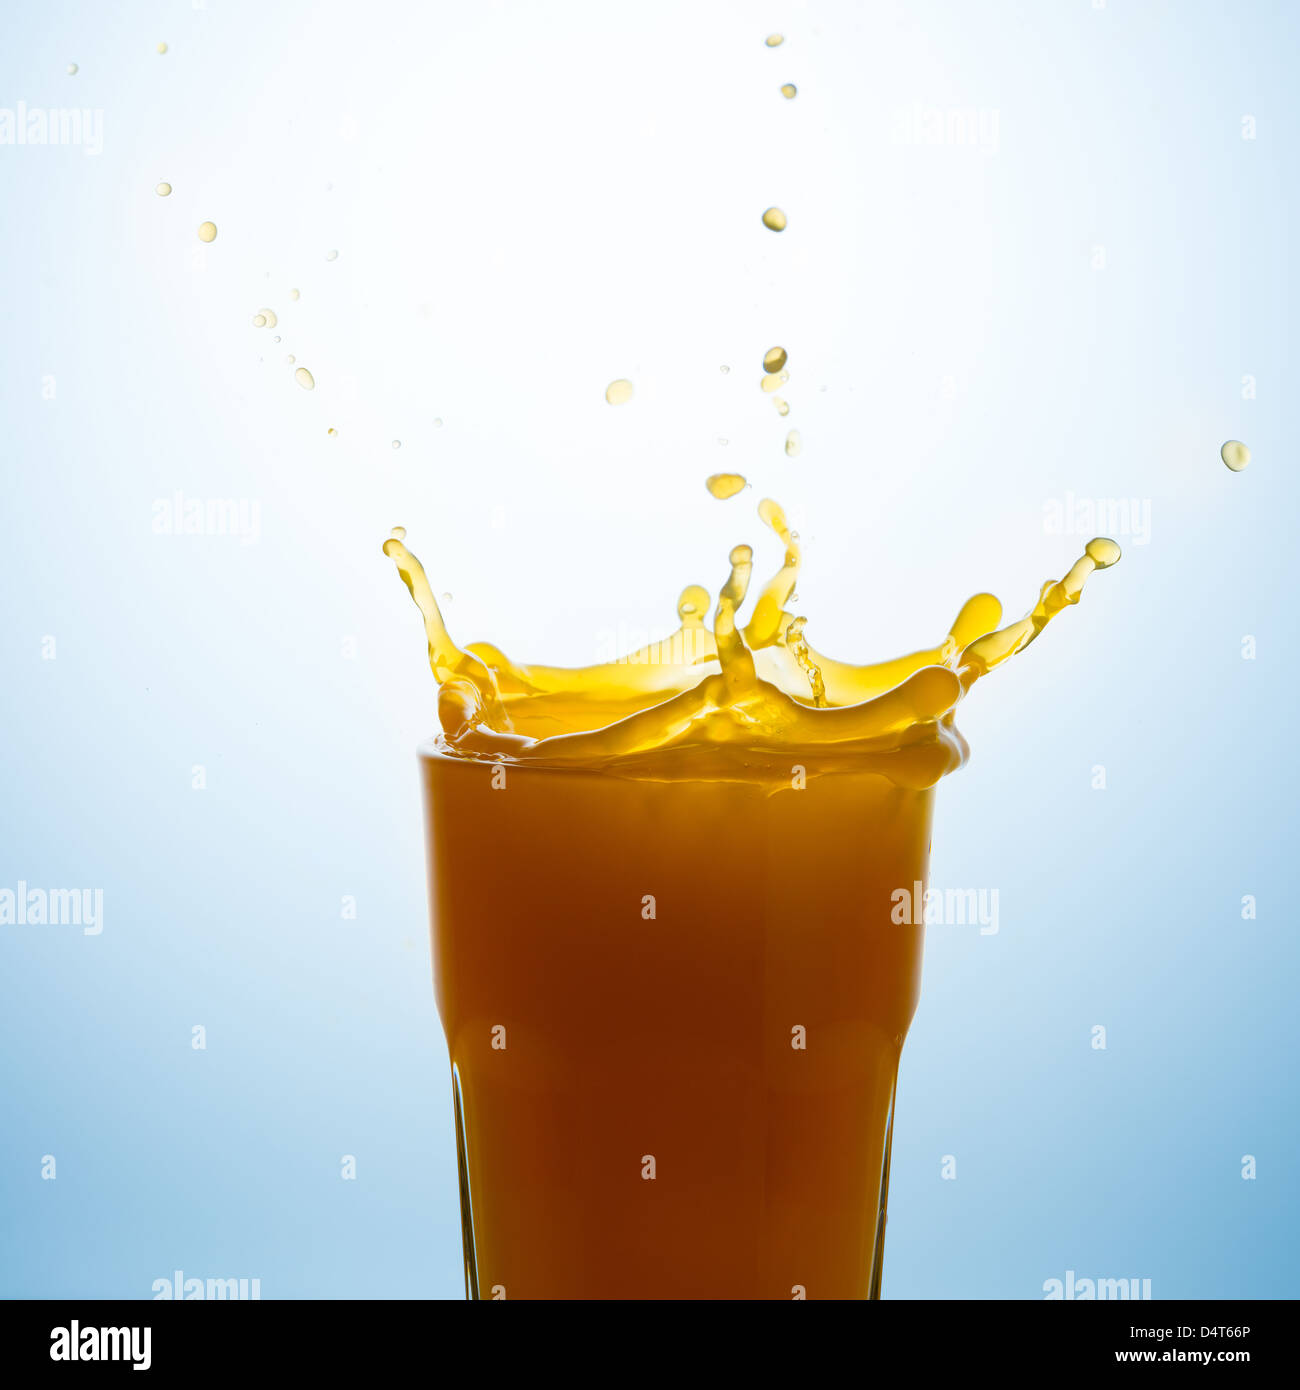 Splash on a glass of orange juice against a blue background - Stock Image